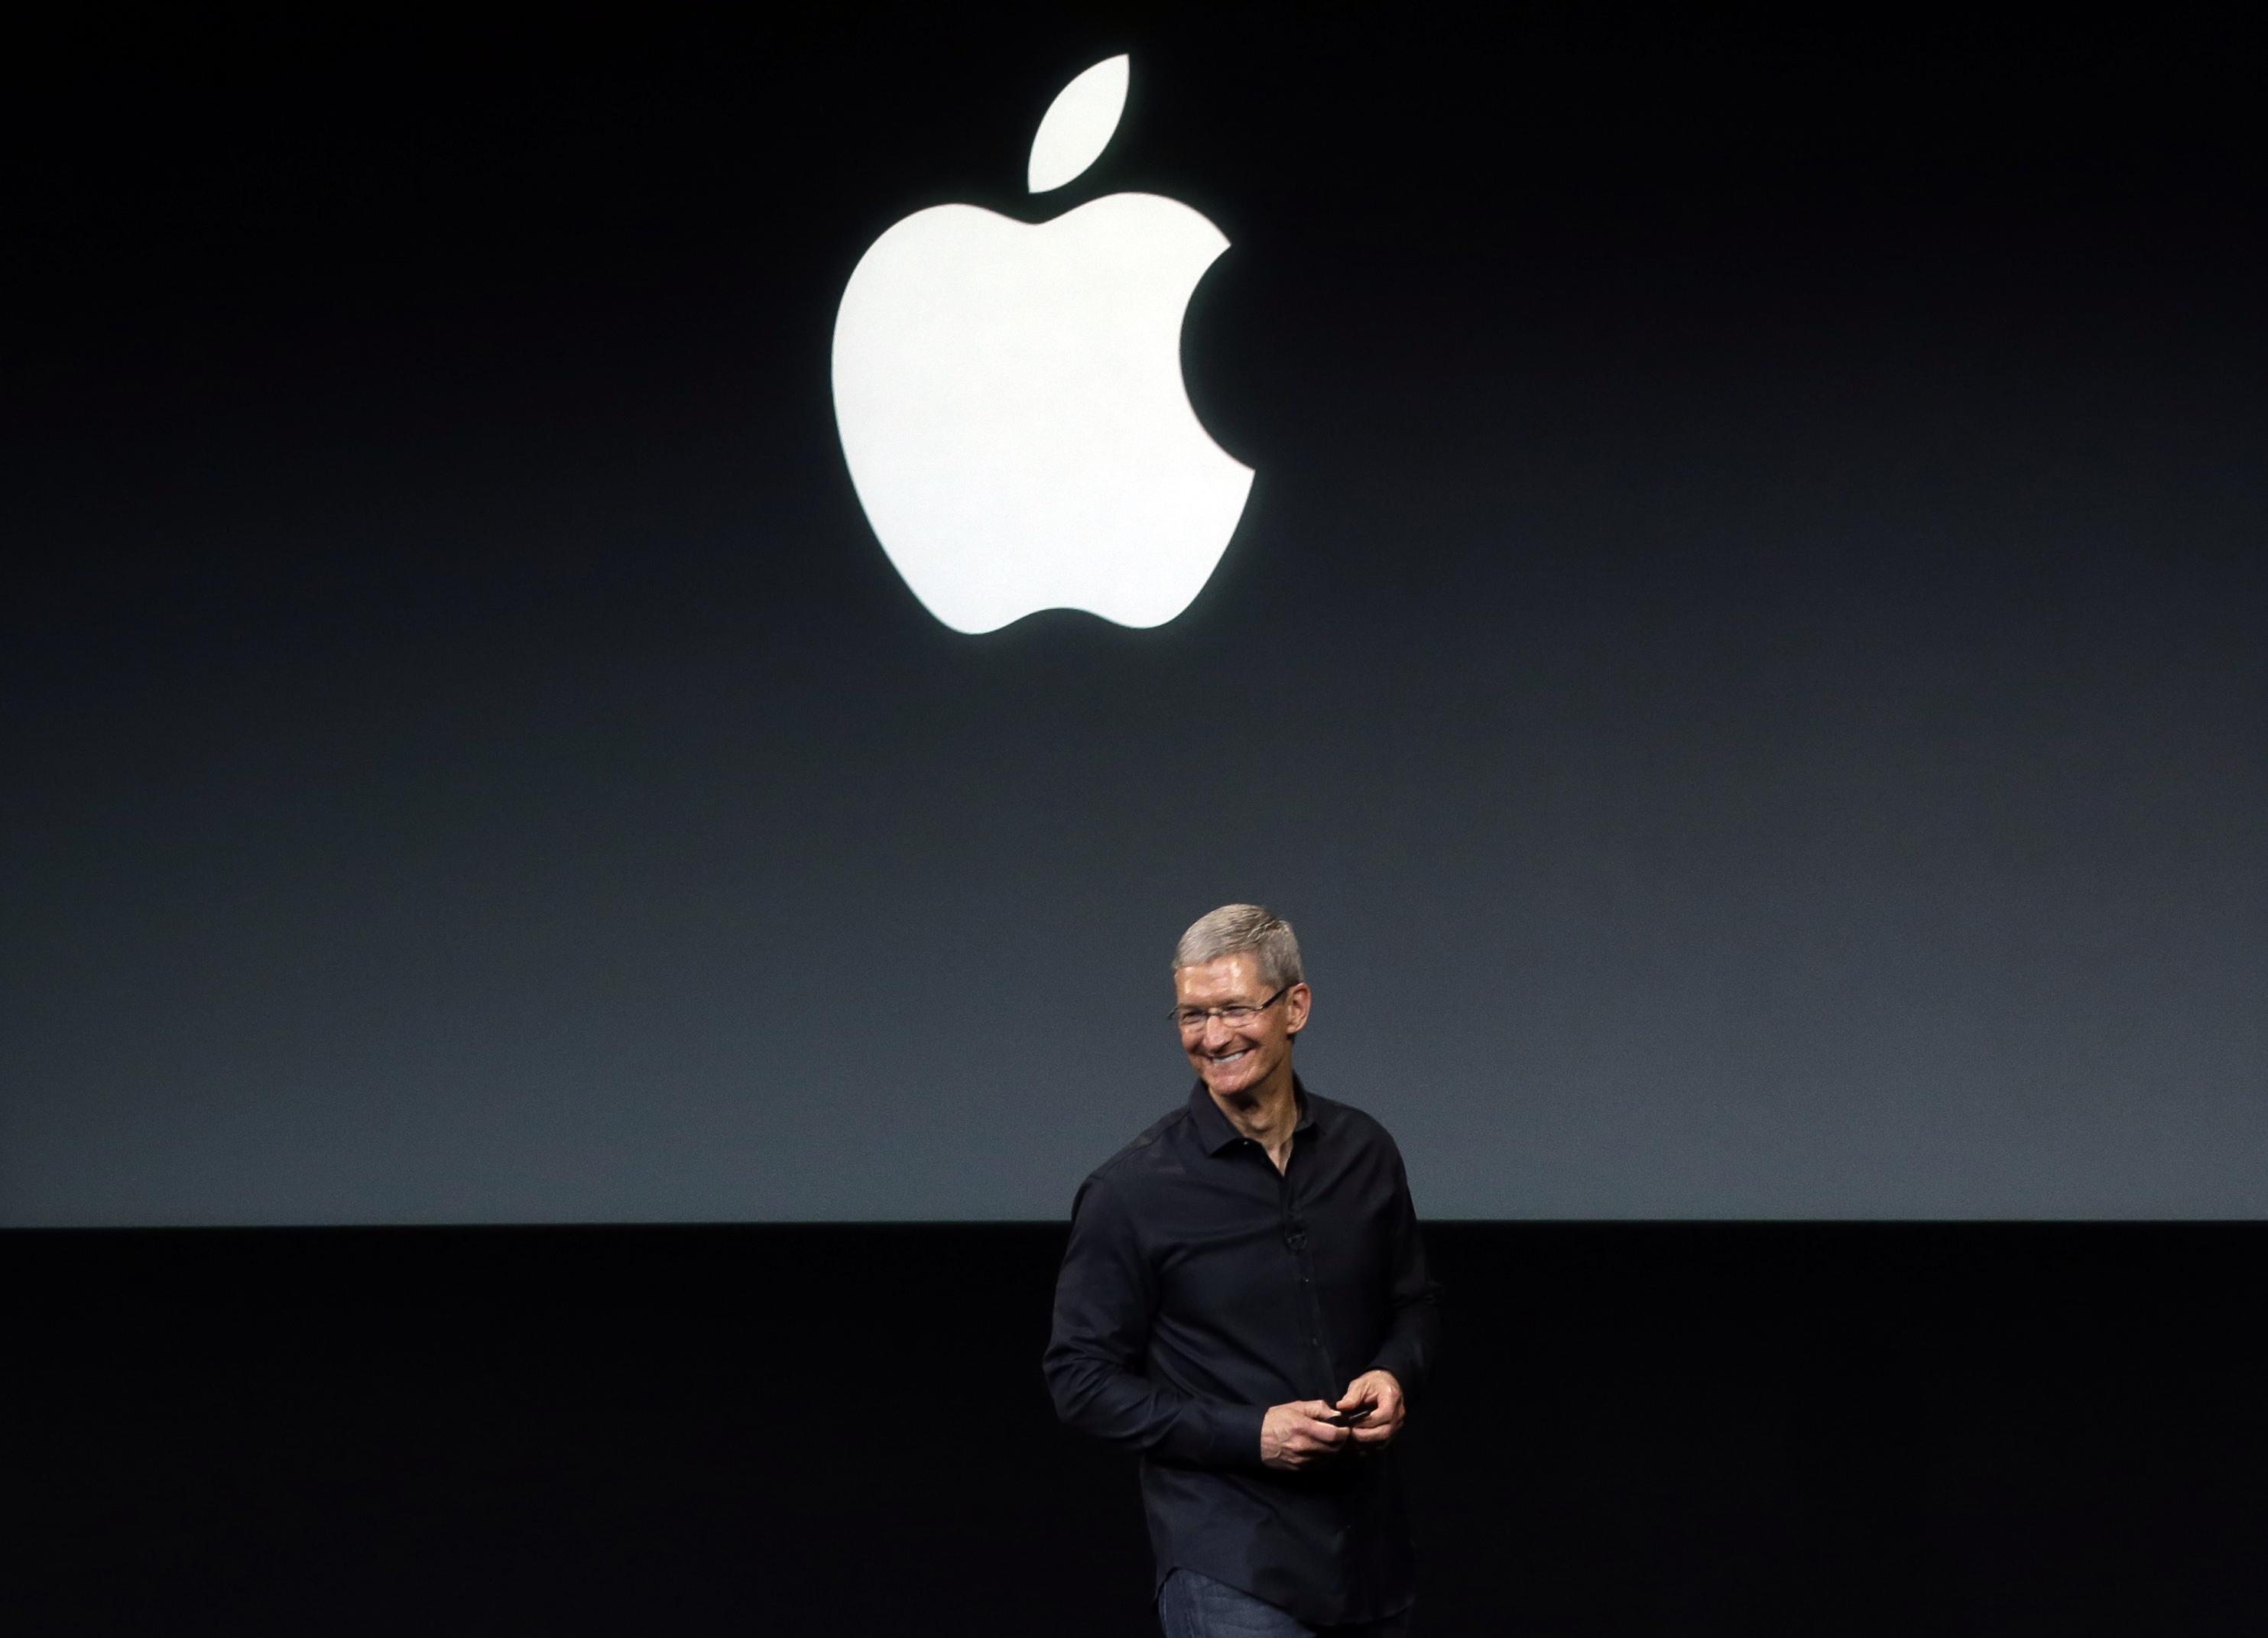 generálny riadite¾ Apple